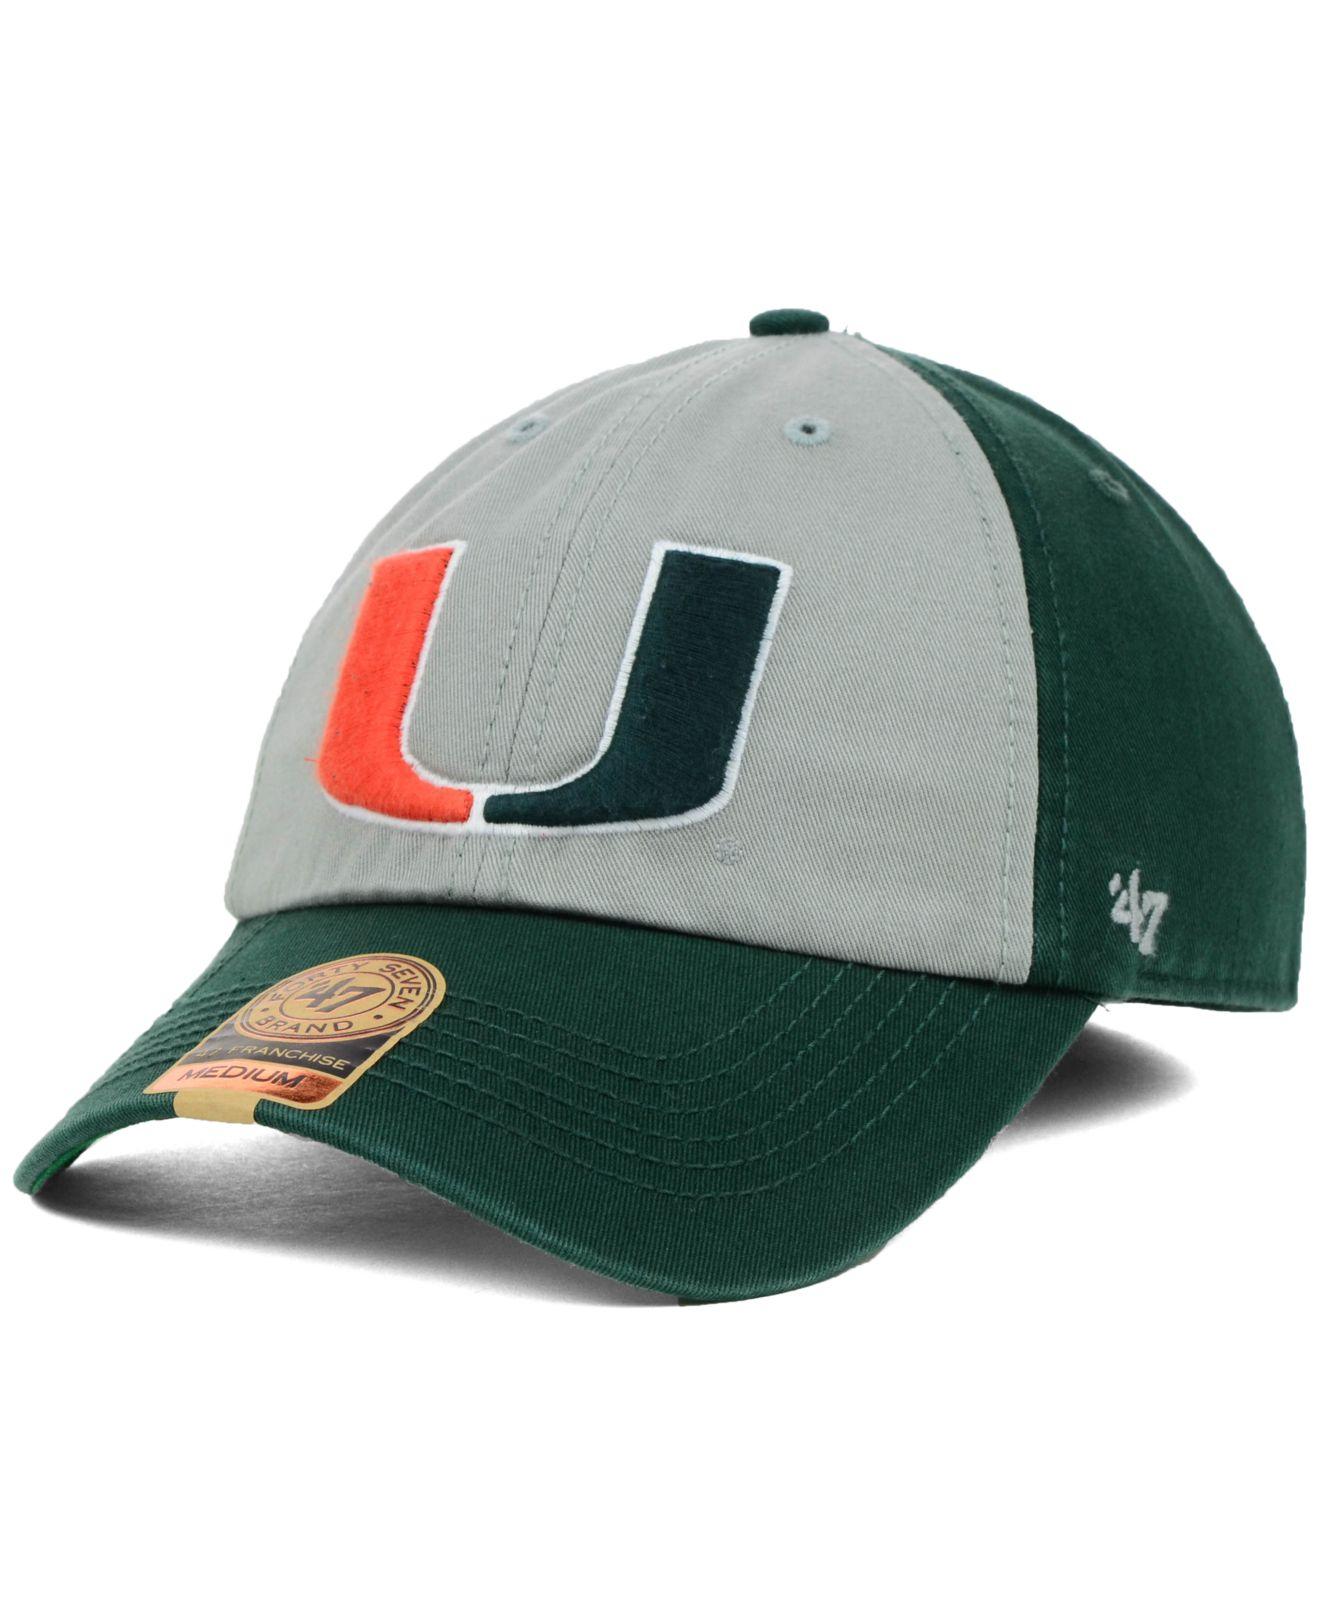 86884ca977fe8 Lyst - 47 Brand Miami Hurricanes Vip Franchise Cap in Green for Men